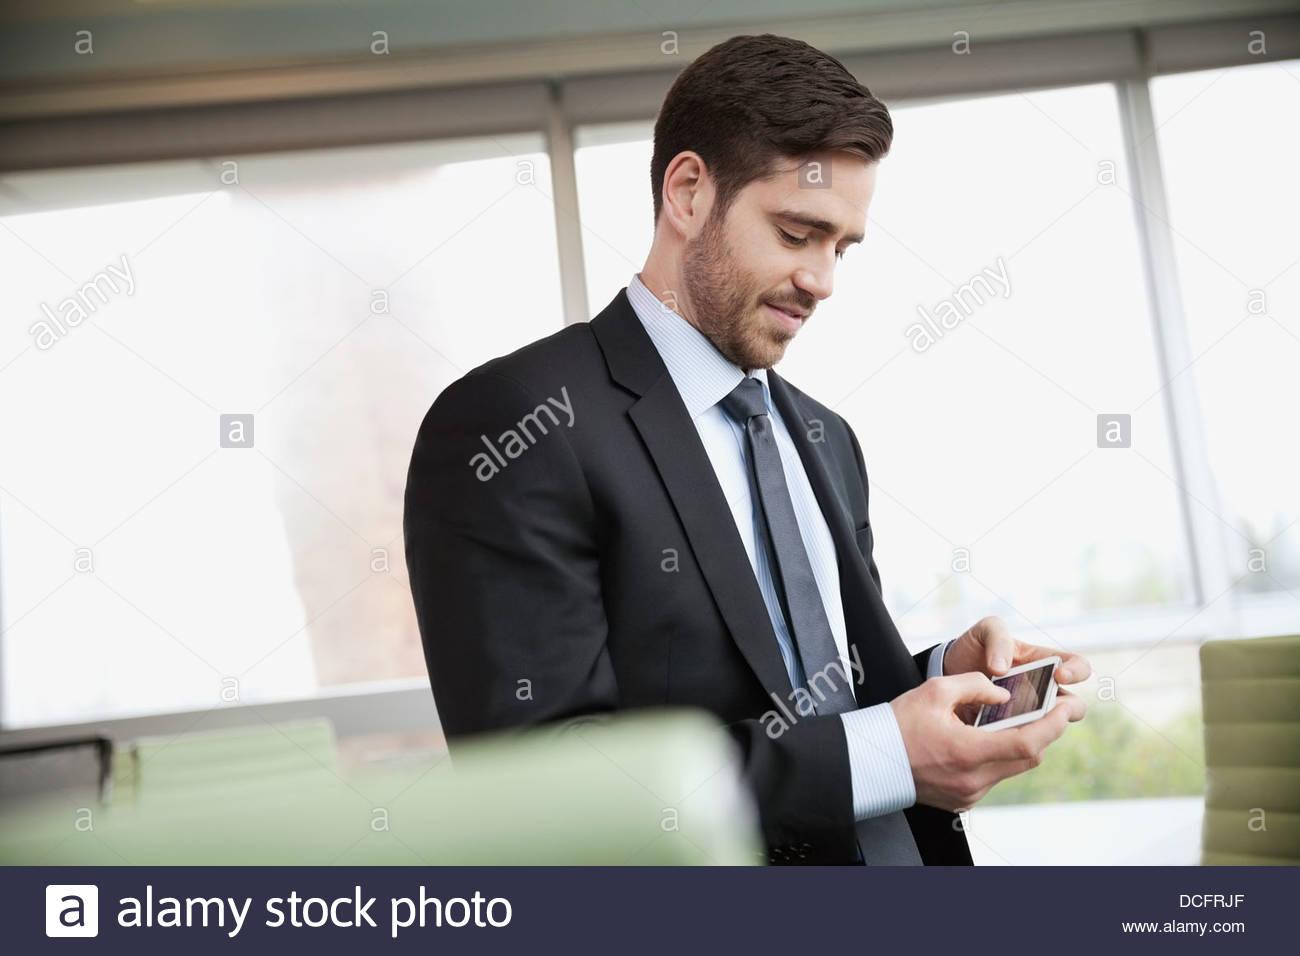 Businessman texting on smart phone - Stock Image